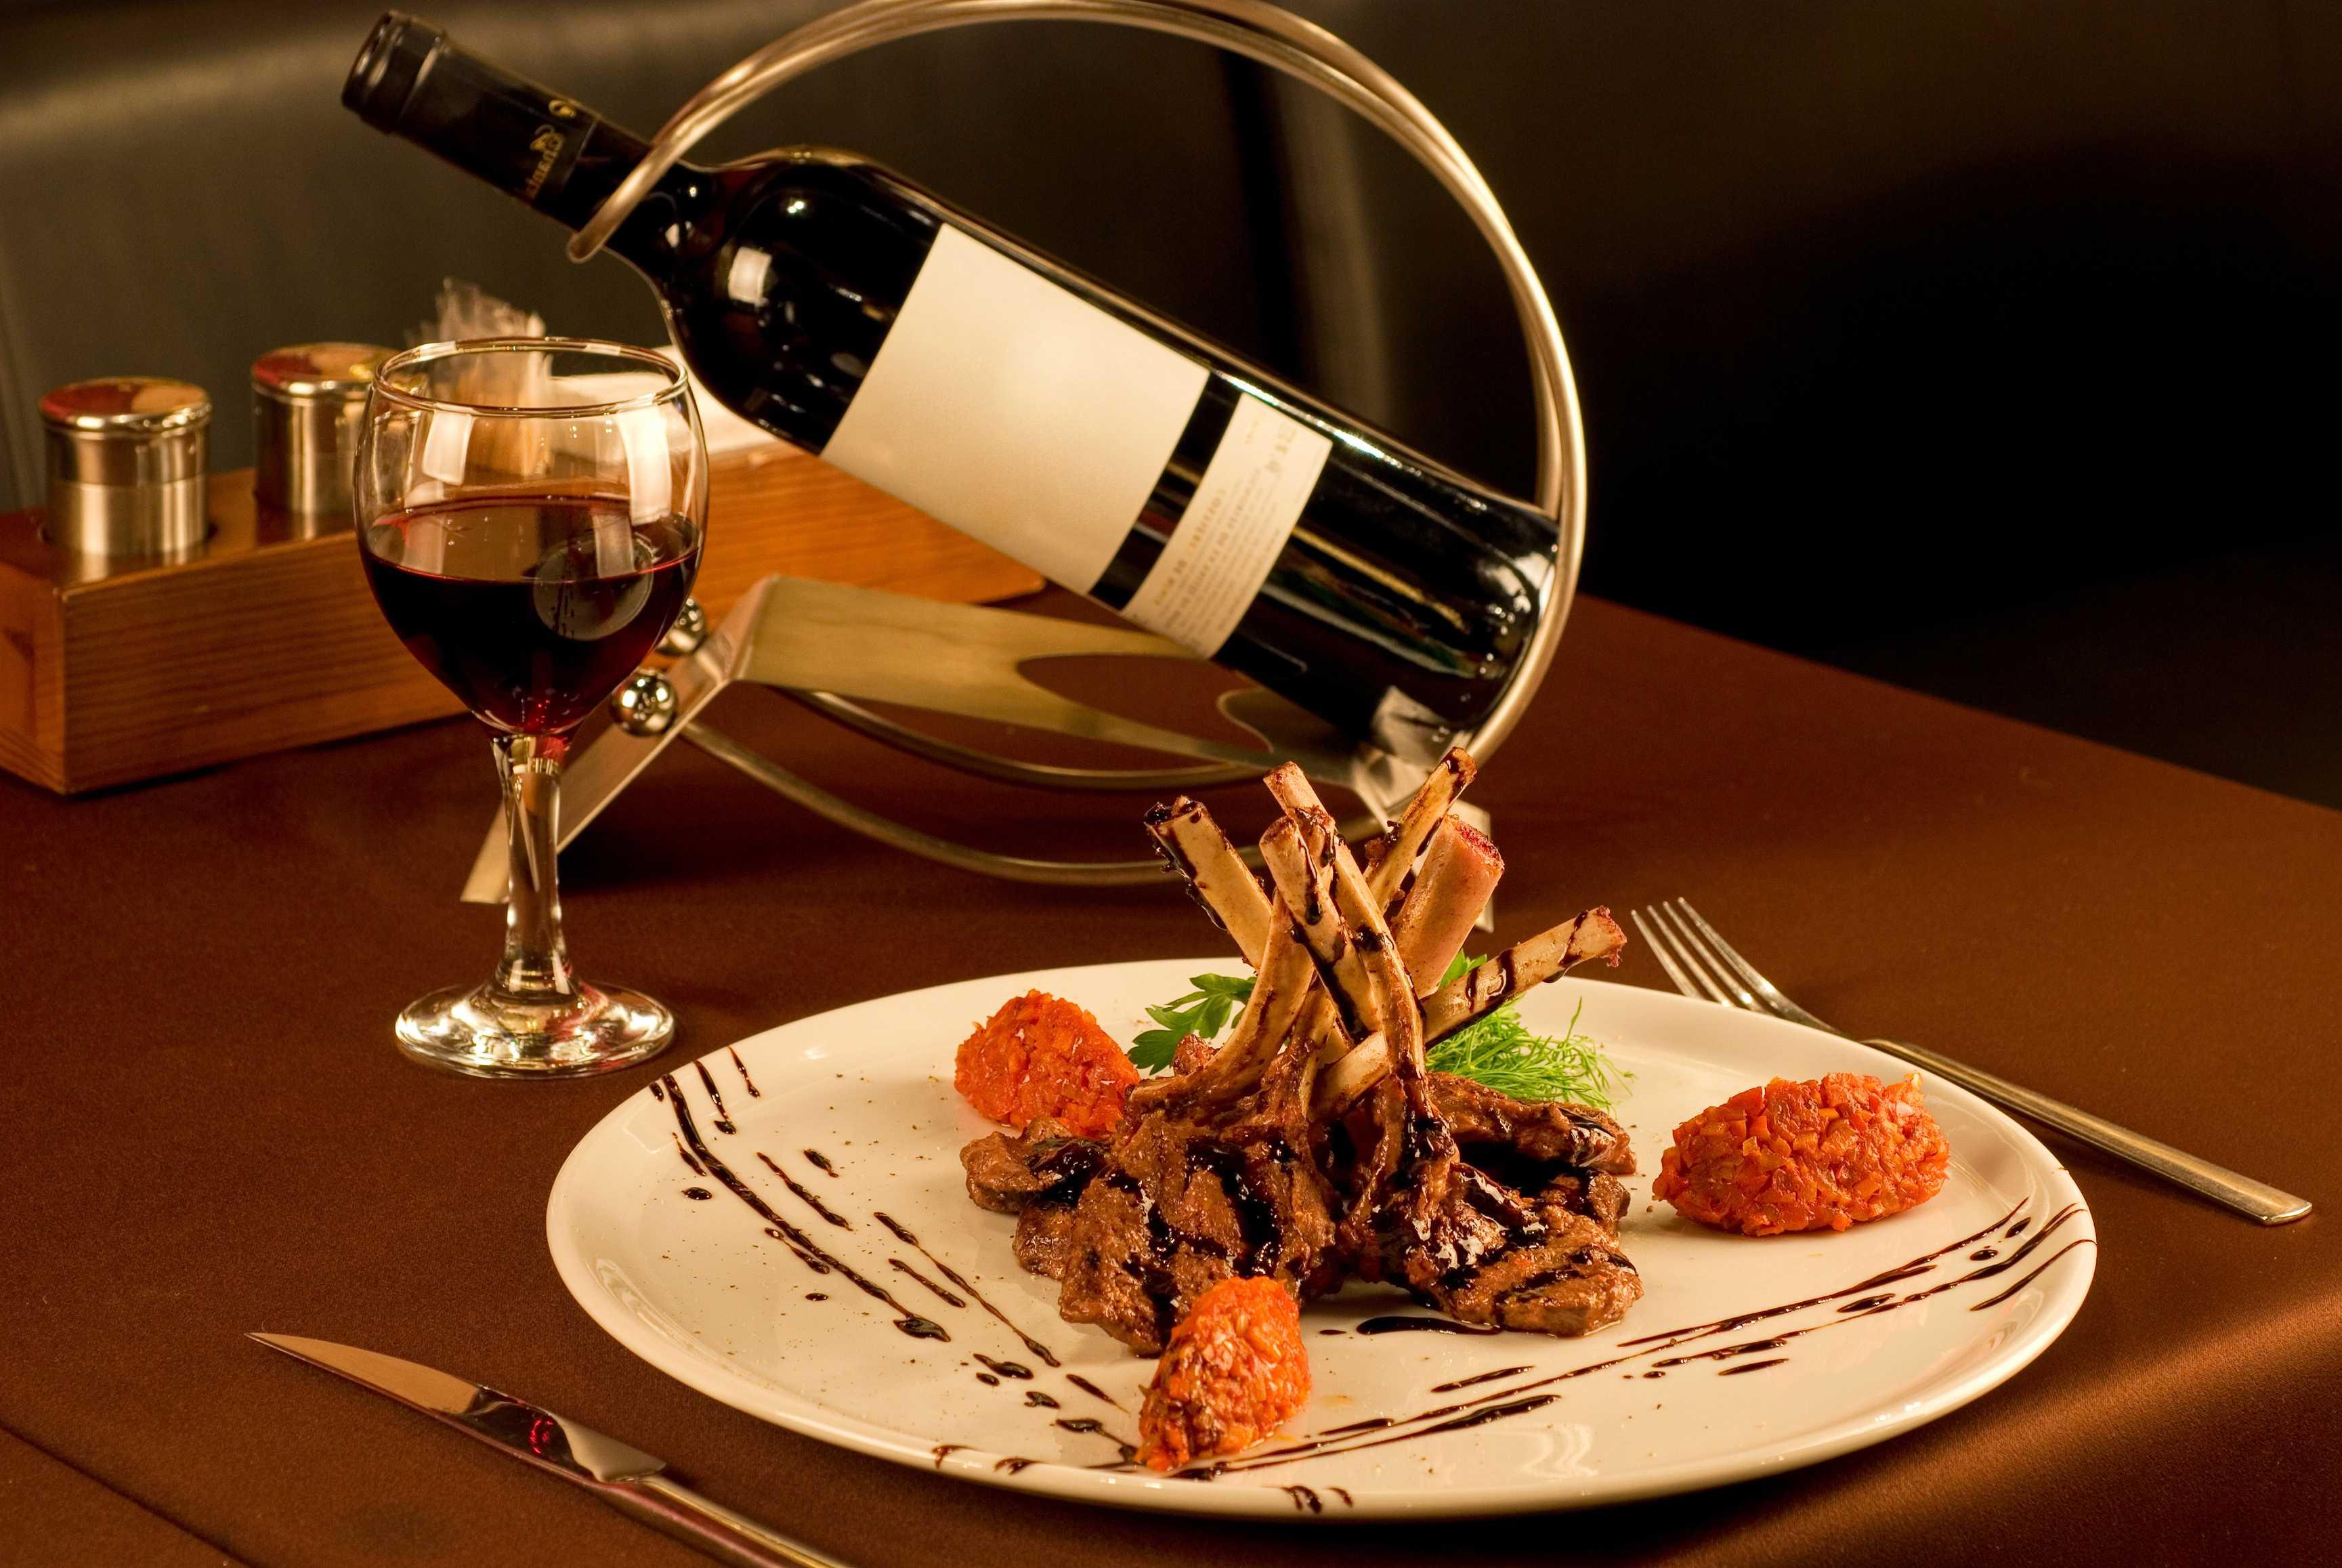 Bucatarie frantuzeasca, cunoscut pentru vinuri finute si mancaruri de exceptie